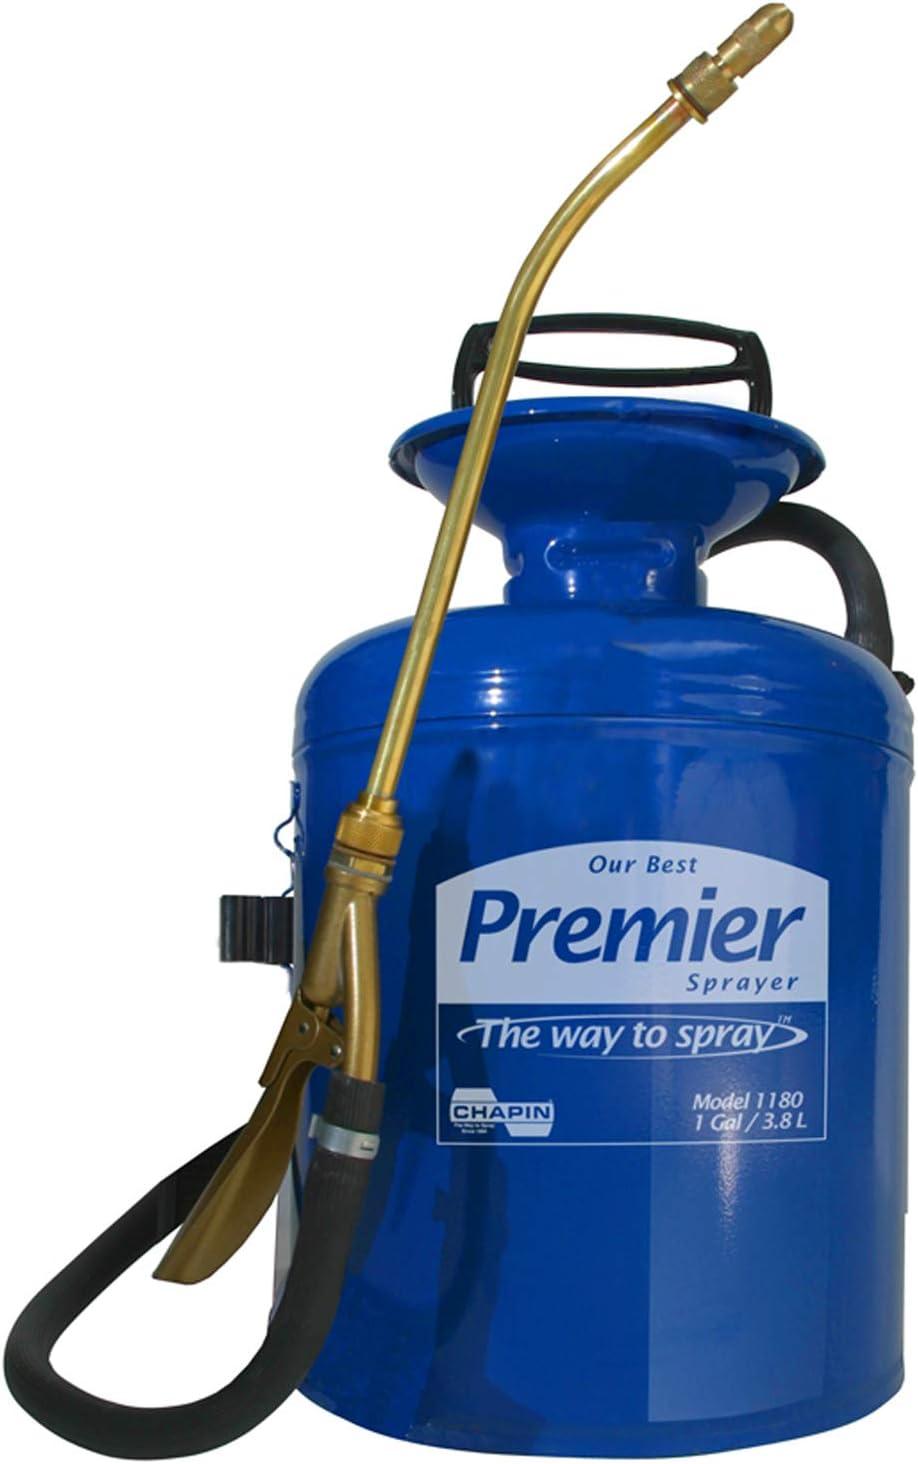 Chapin 1280 Premier Pro Tri-Poxy Steel Sprayer 2 Gallon Pest Control Sprayer